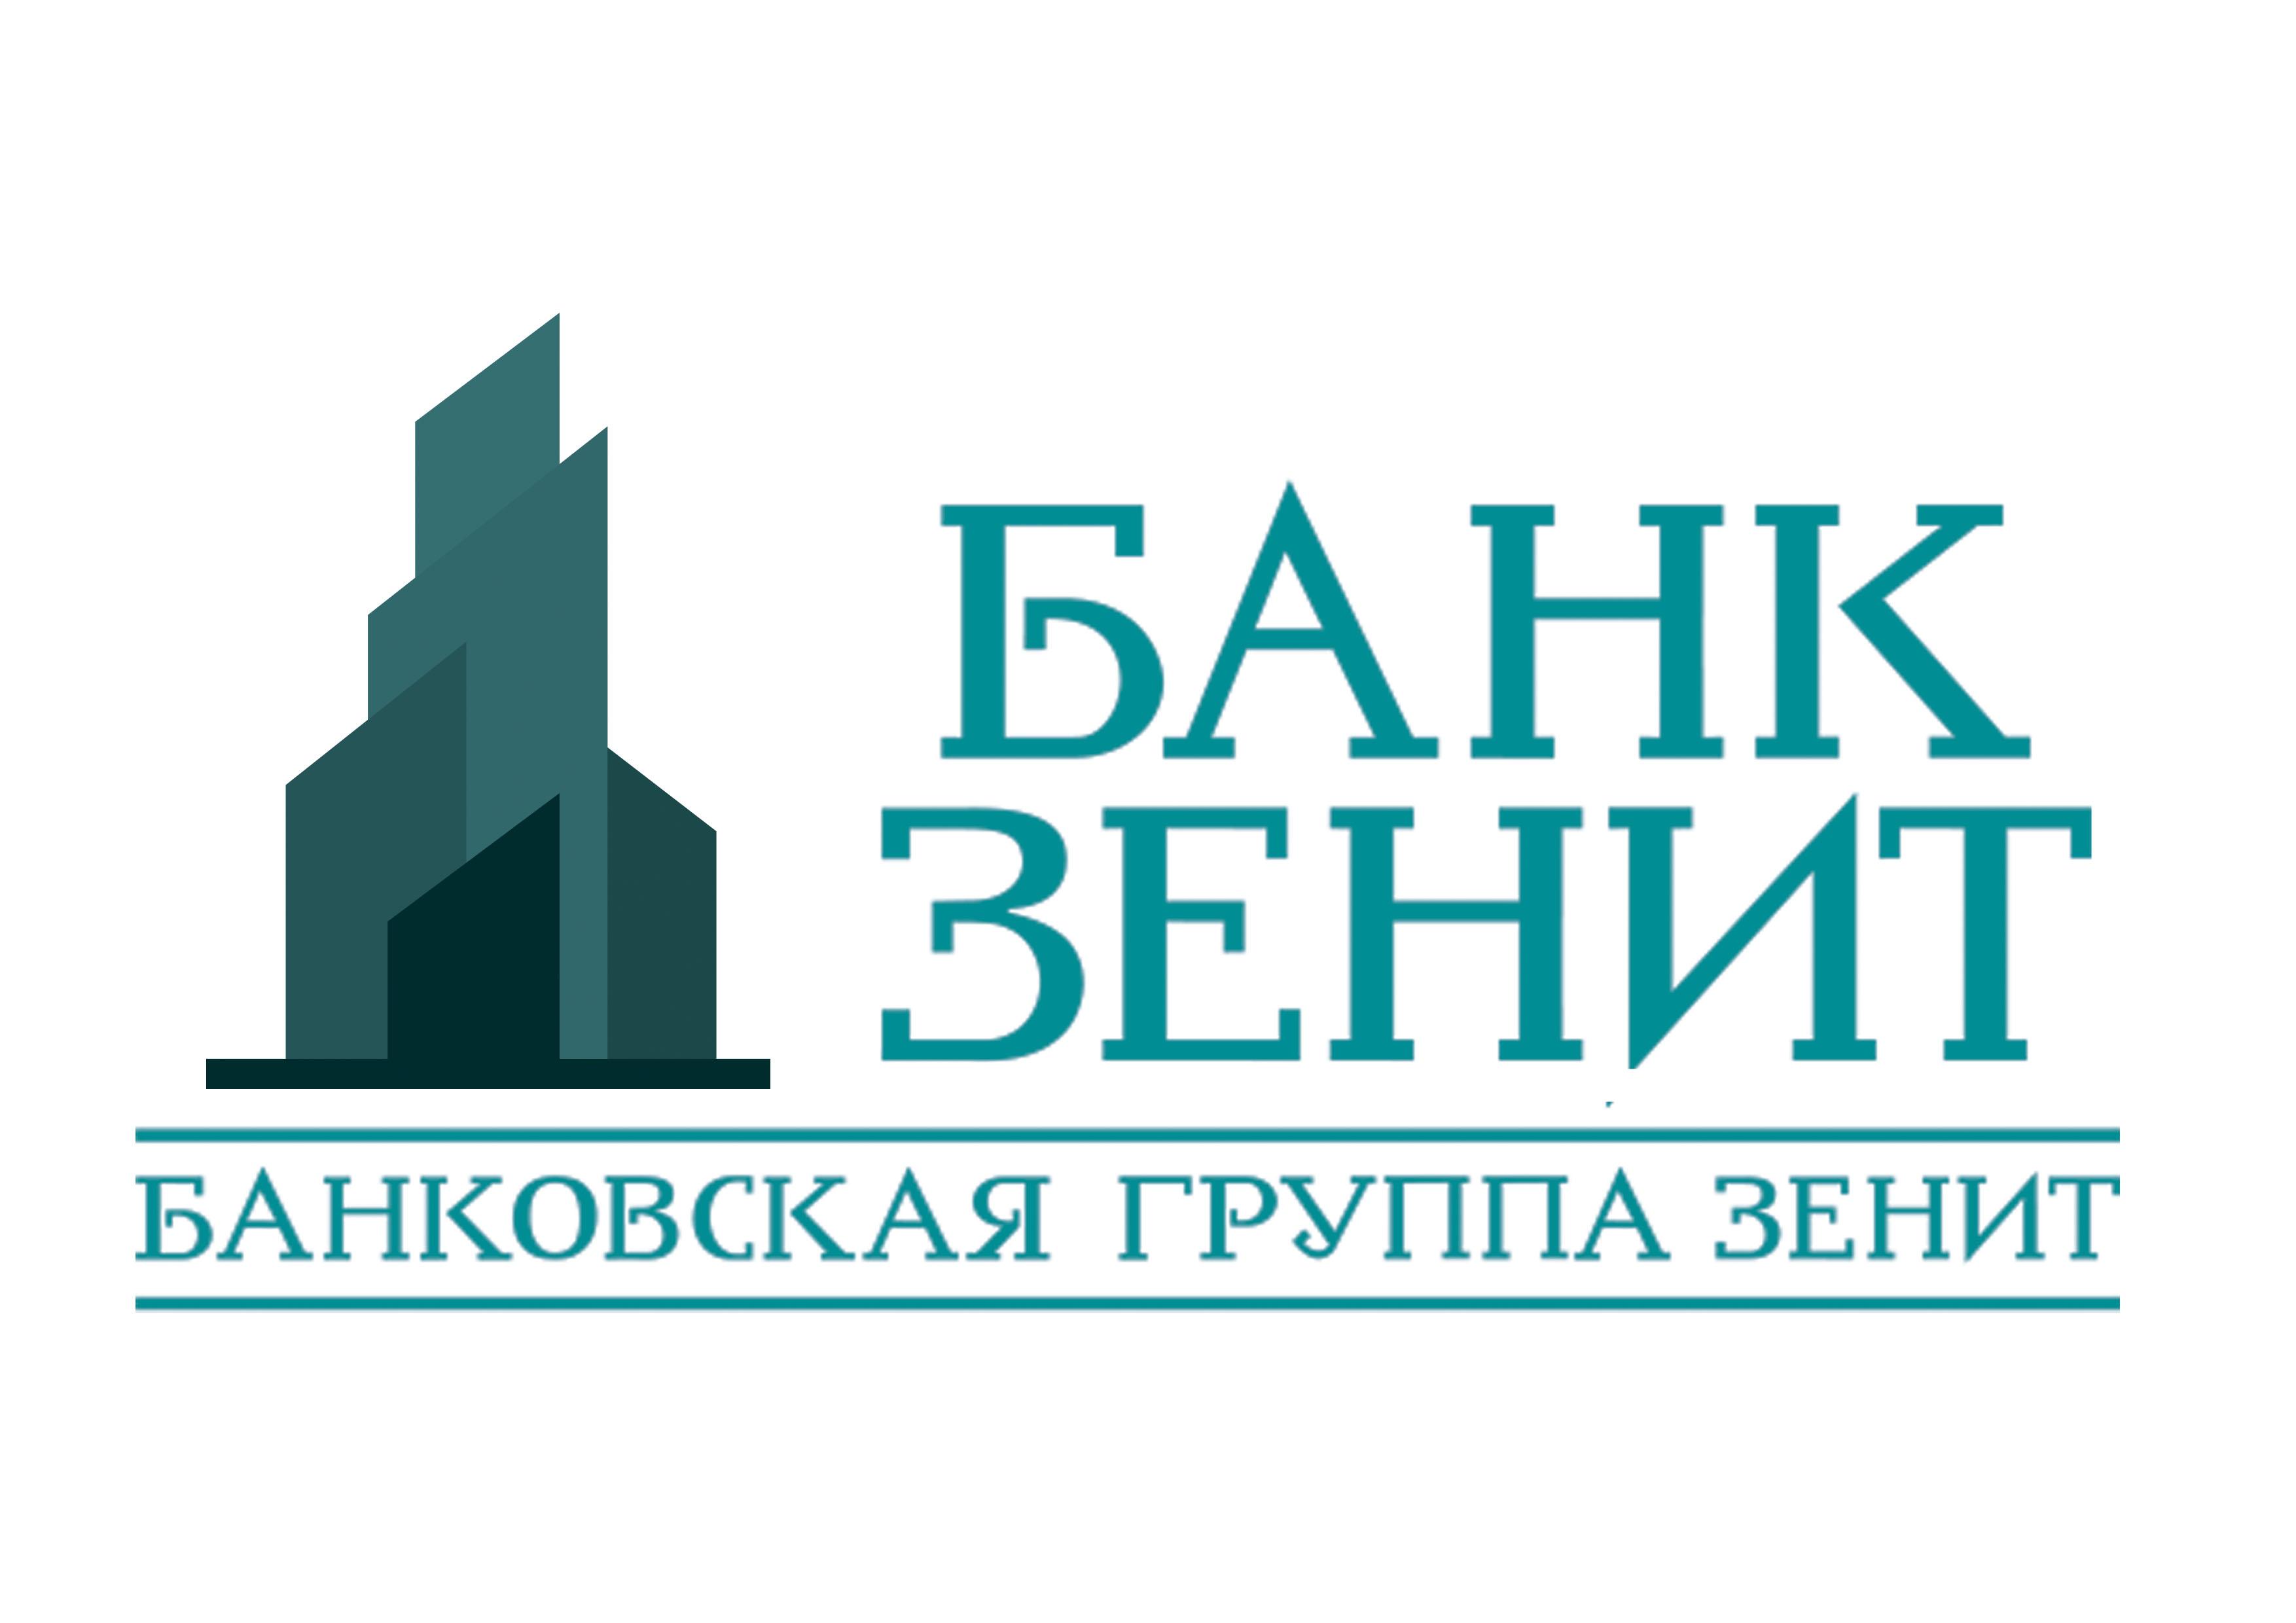 Разработка логотипа для Банка ЗЕНИТ фото f_5735b50f5613cb96.jpg